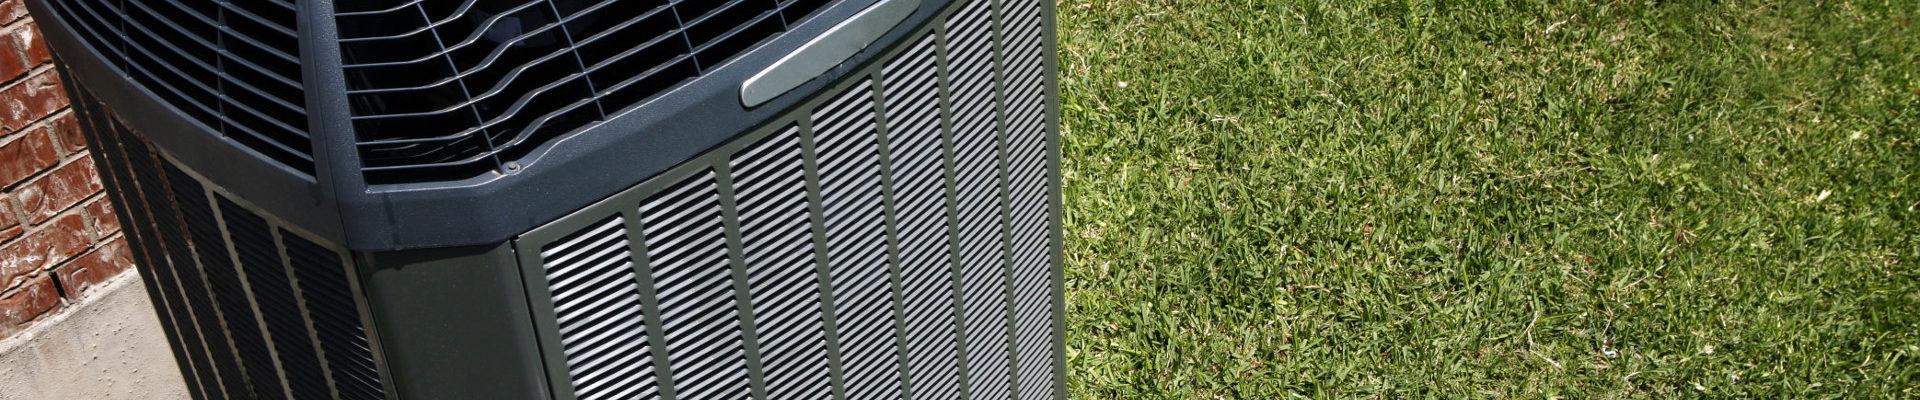 Air Conditioner Repair Service Colorado Springs CO on Same Day